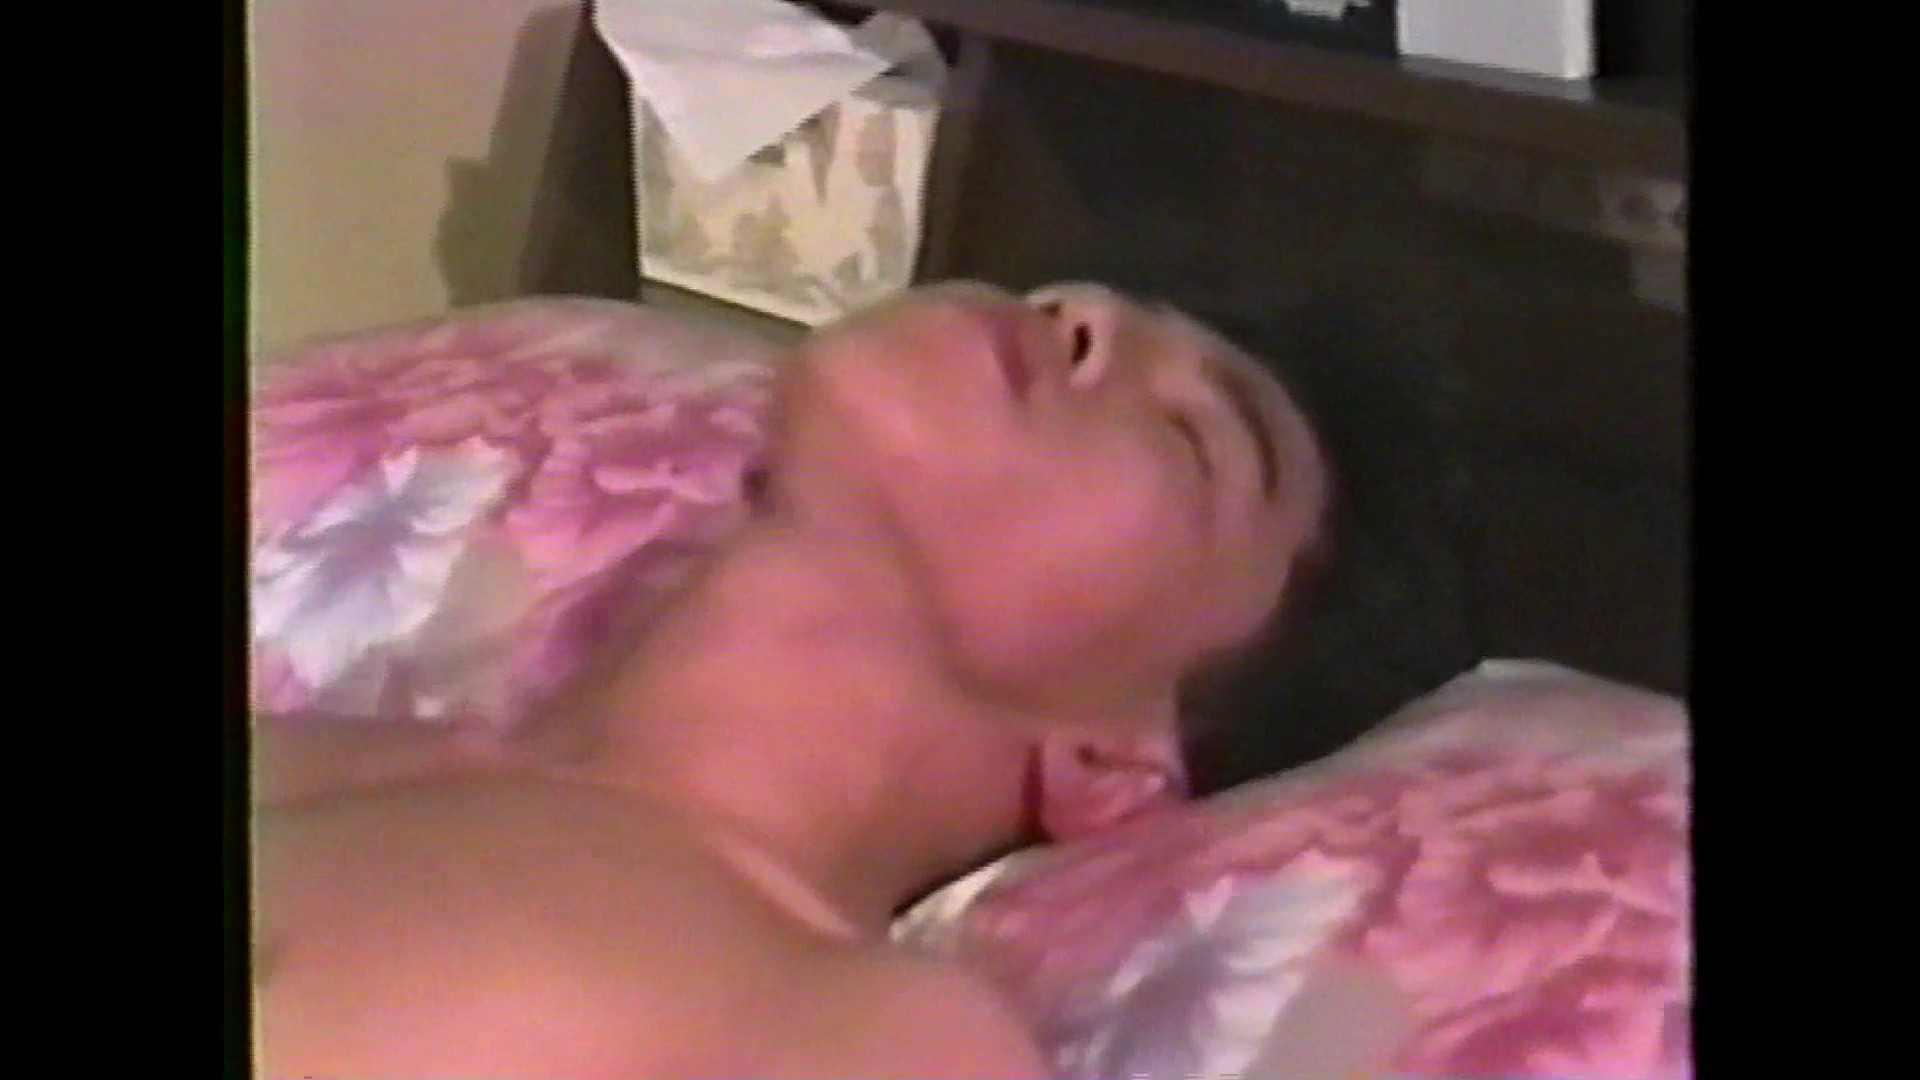 GAYBOY宏のオカズ倉庫Vol.2-1 風呂天国 ゲイ丸見え画像 114枚 98